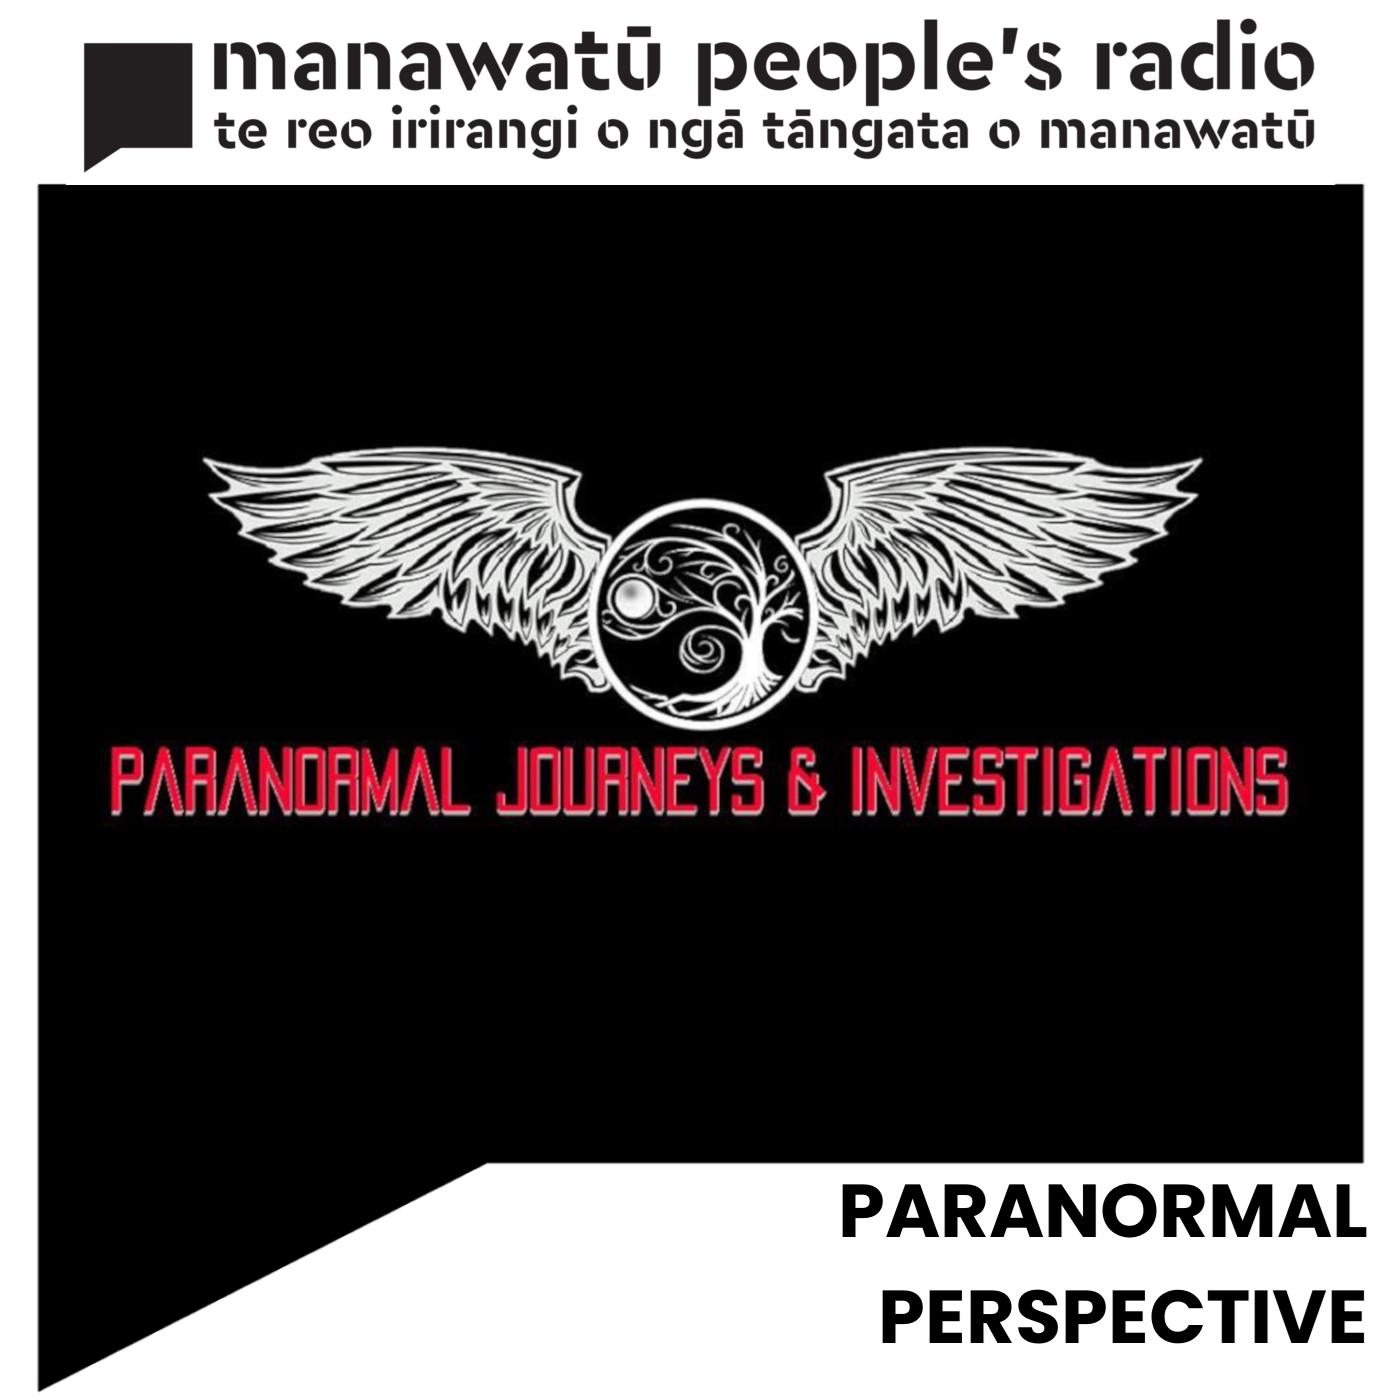 https://cdn.accessradio.org/StationFolder/manawatu/Images/MPRParanormal.png